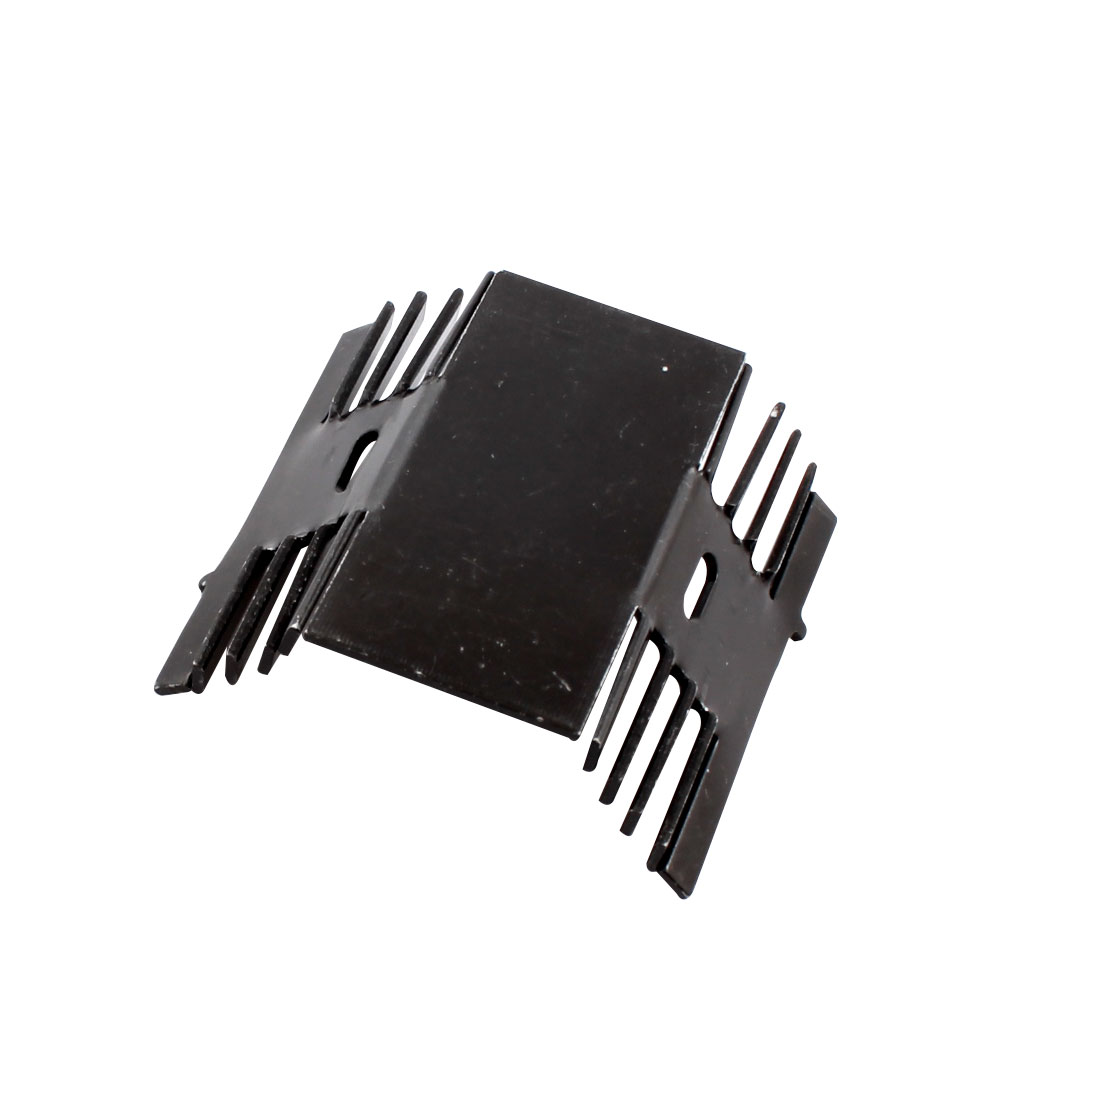 Electronic Component Aluminium Heatsink Radiator Heat Spreader Cooler Fin Black 60mmx55mmx22mm for Transistor